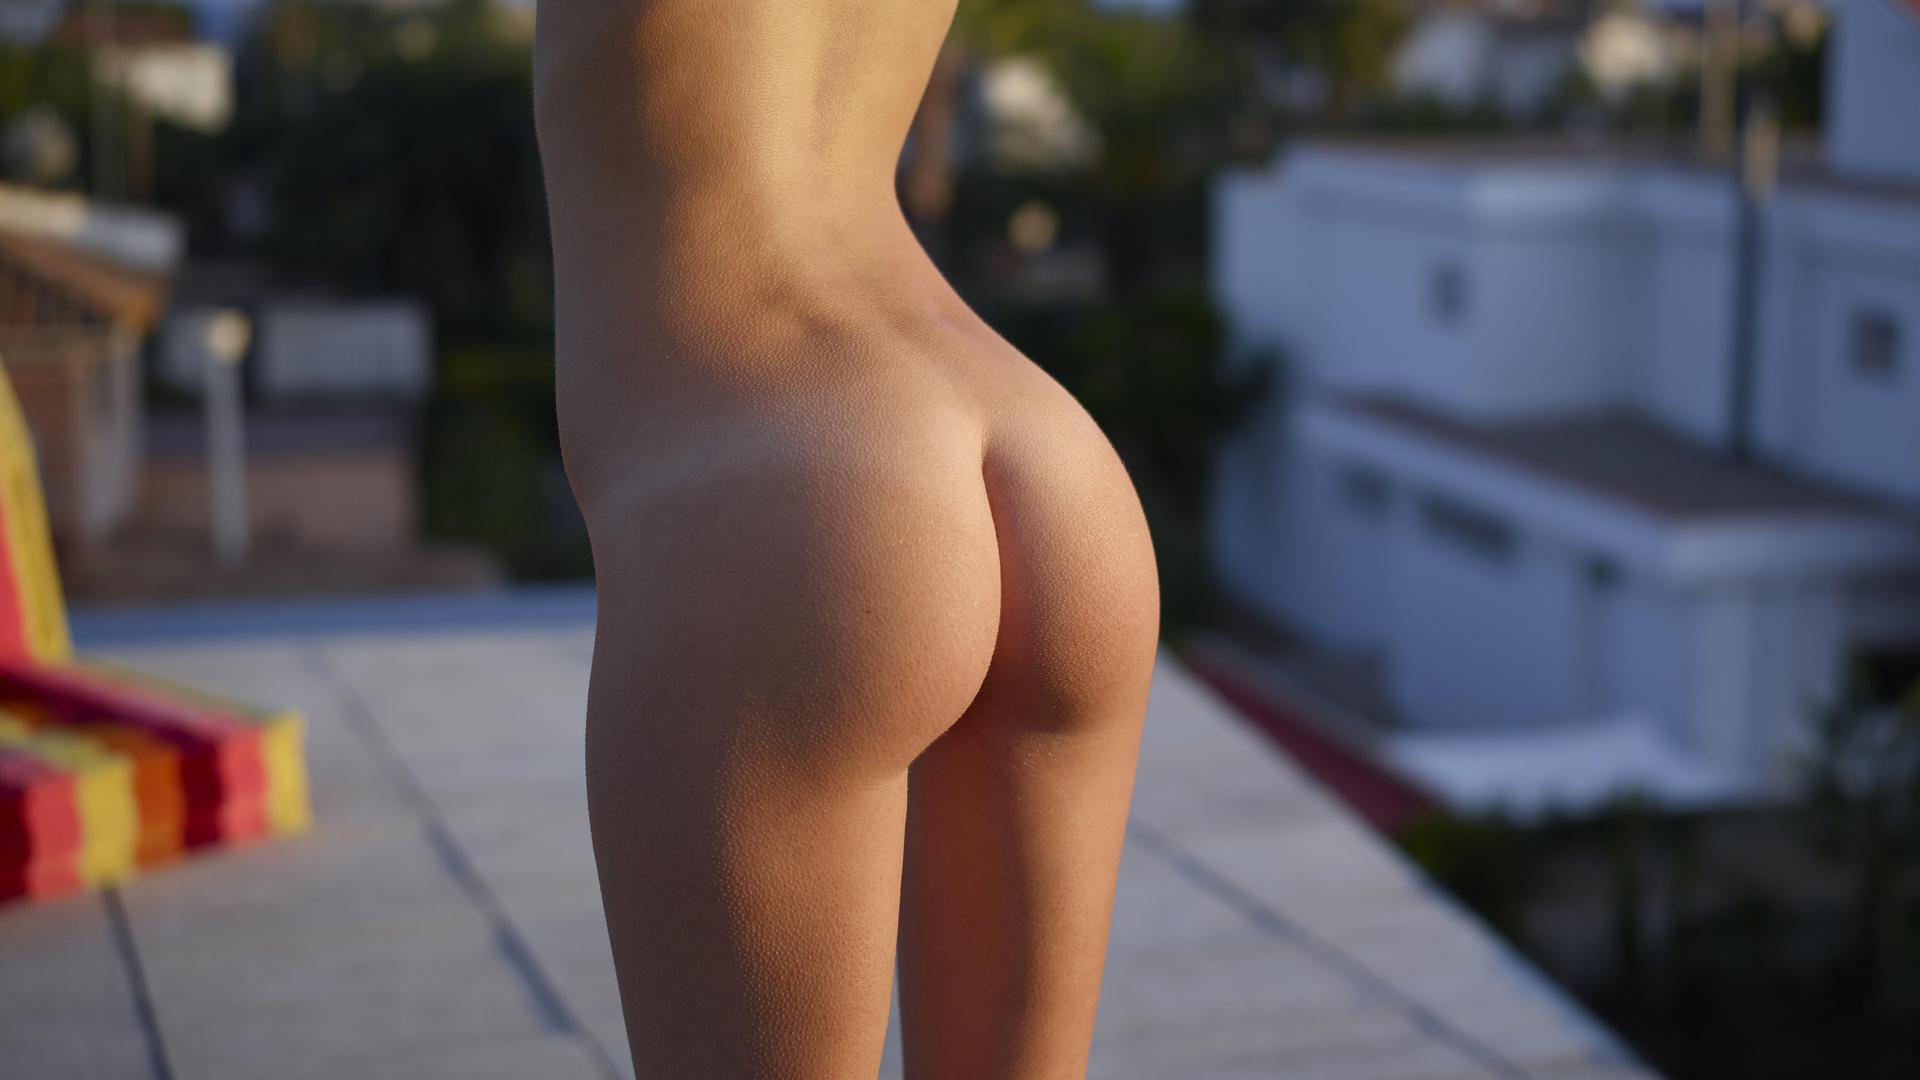 Small girls nude